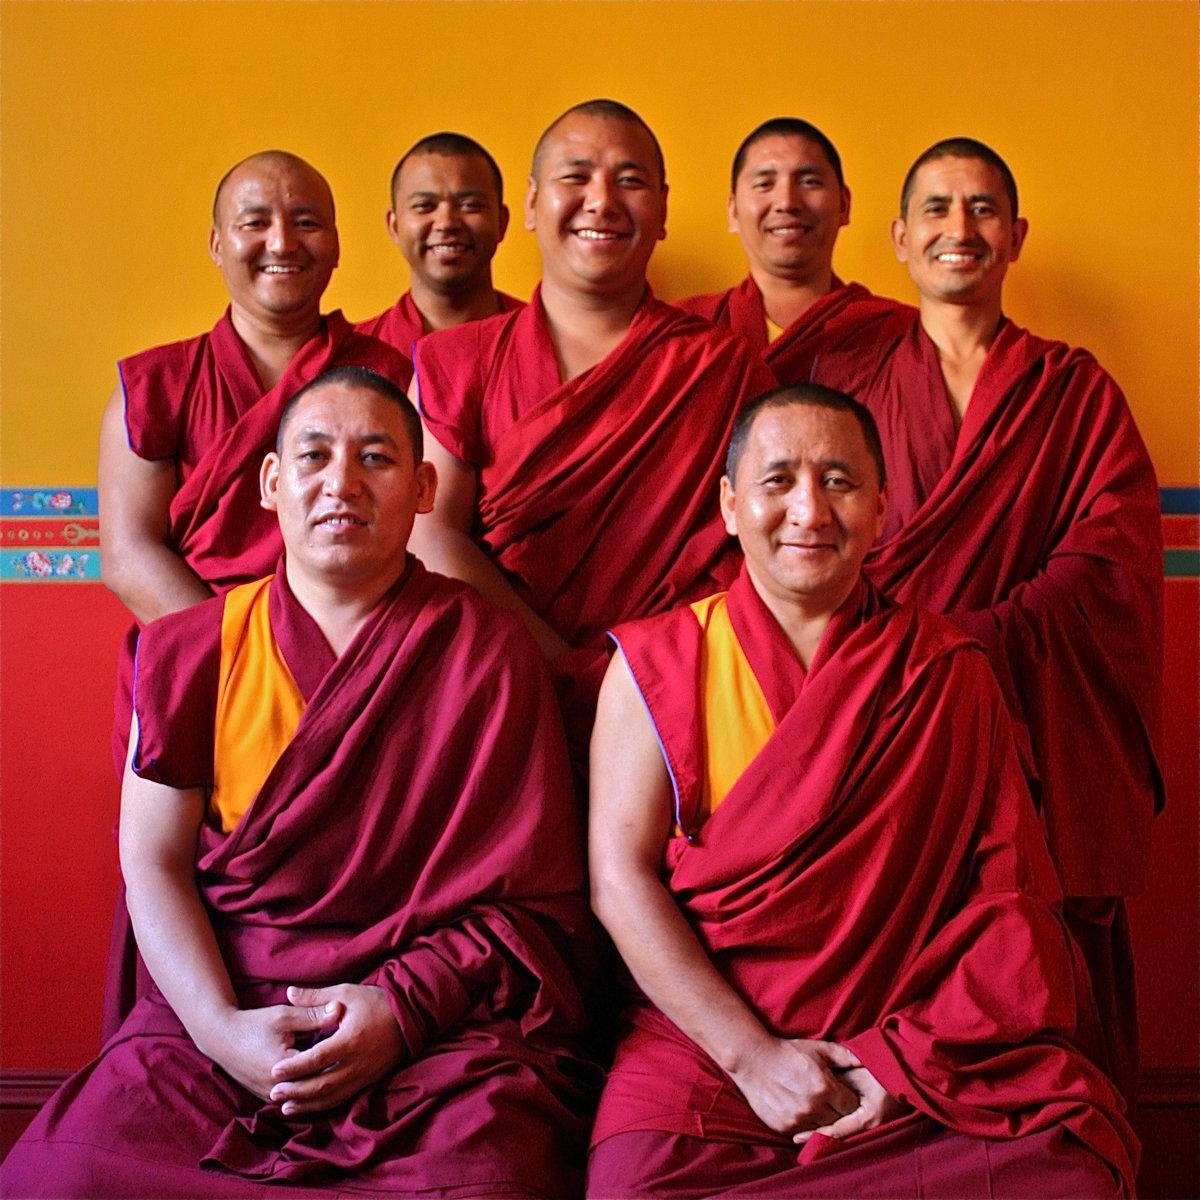 Om Mani Padme Hum Mantra Tashi Lhunpo Monks